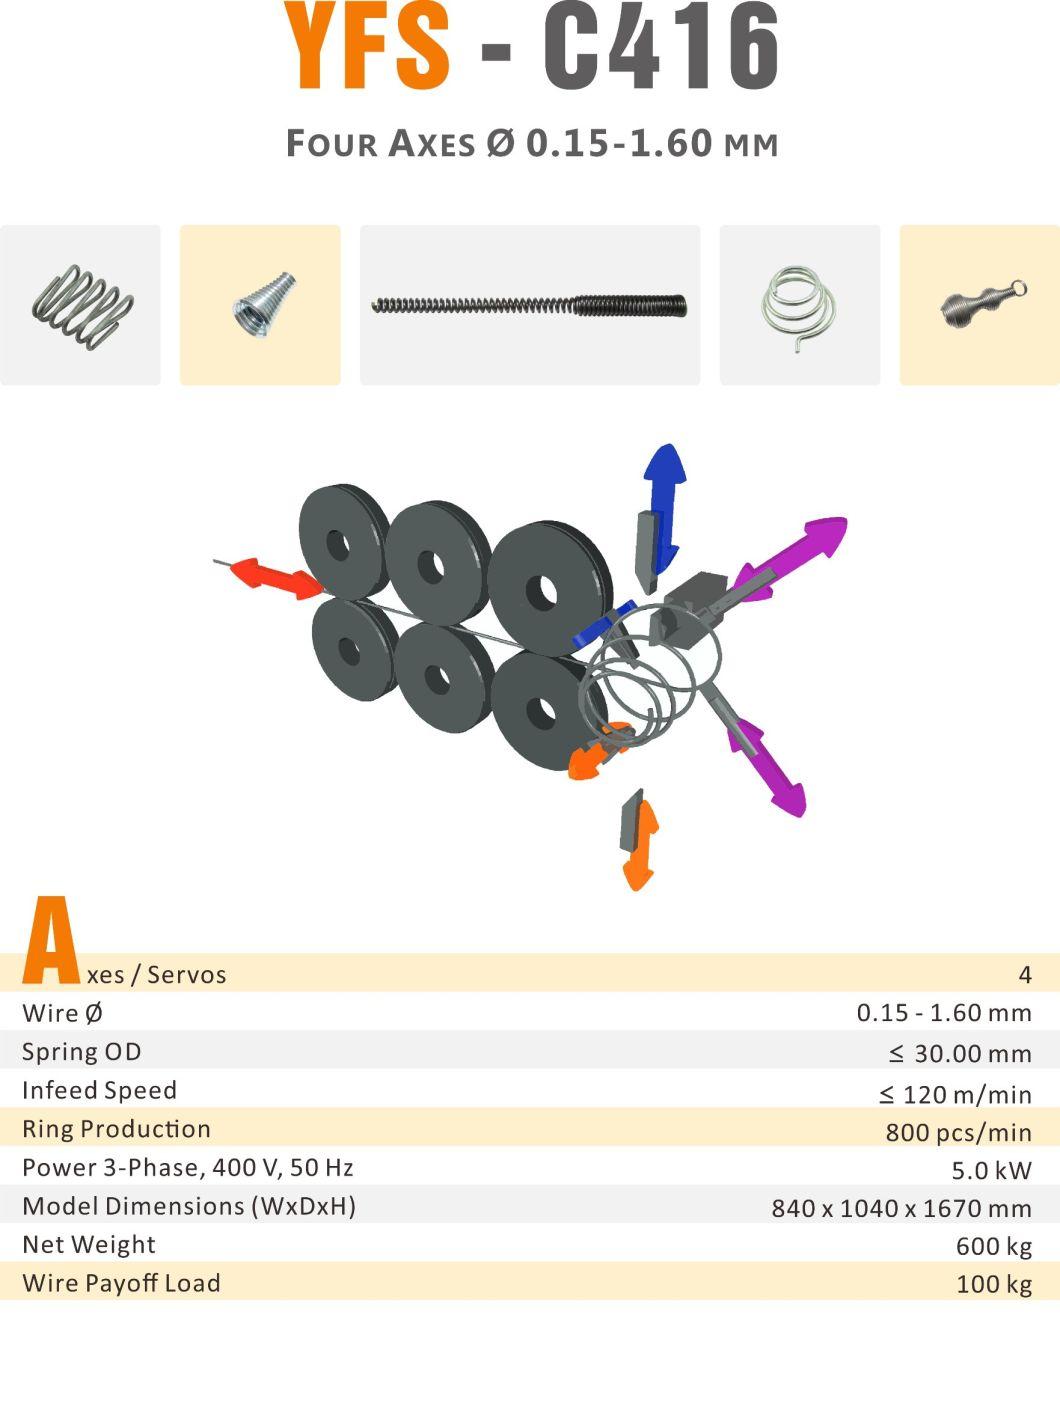 YFSpring Coilers C416 - Multi Servos Wire Diameter 0.15 - 1.60 mm - Compression Spring Coiler